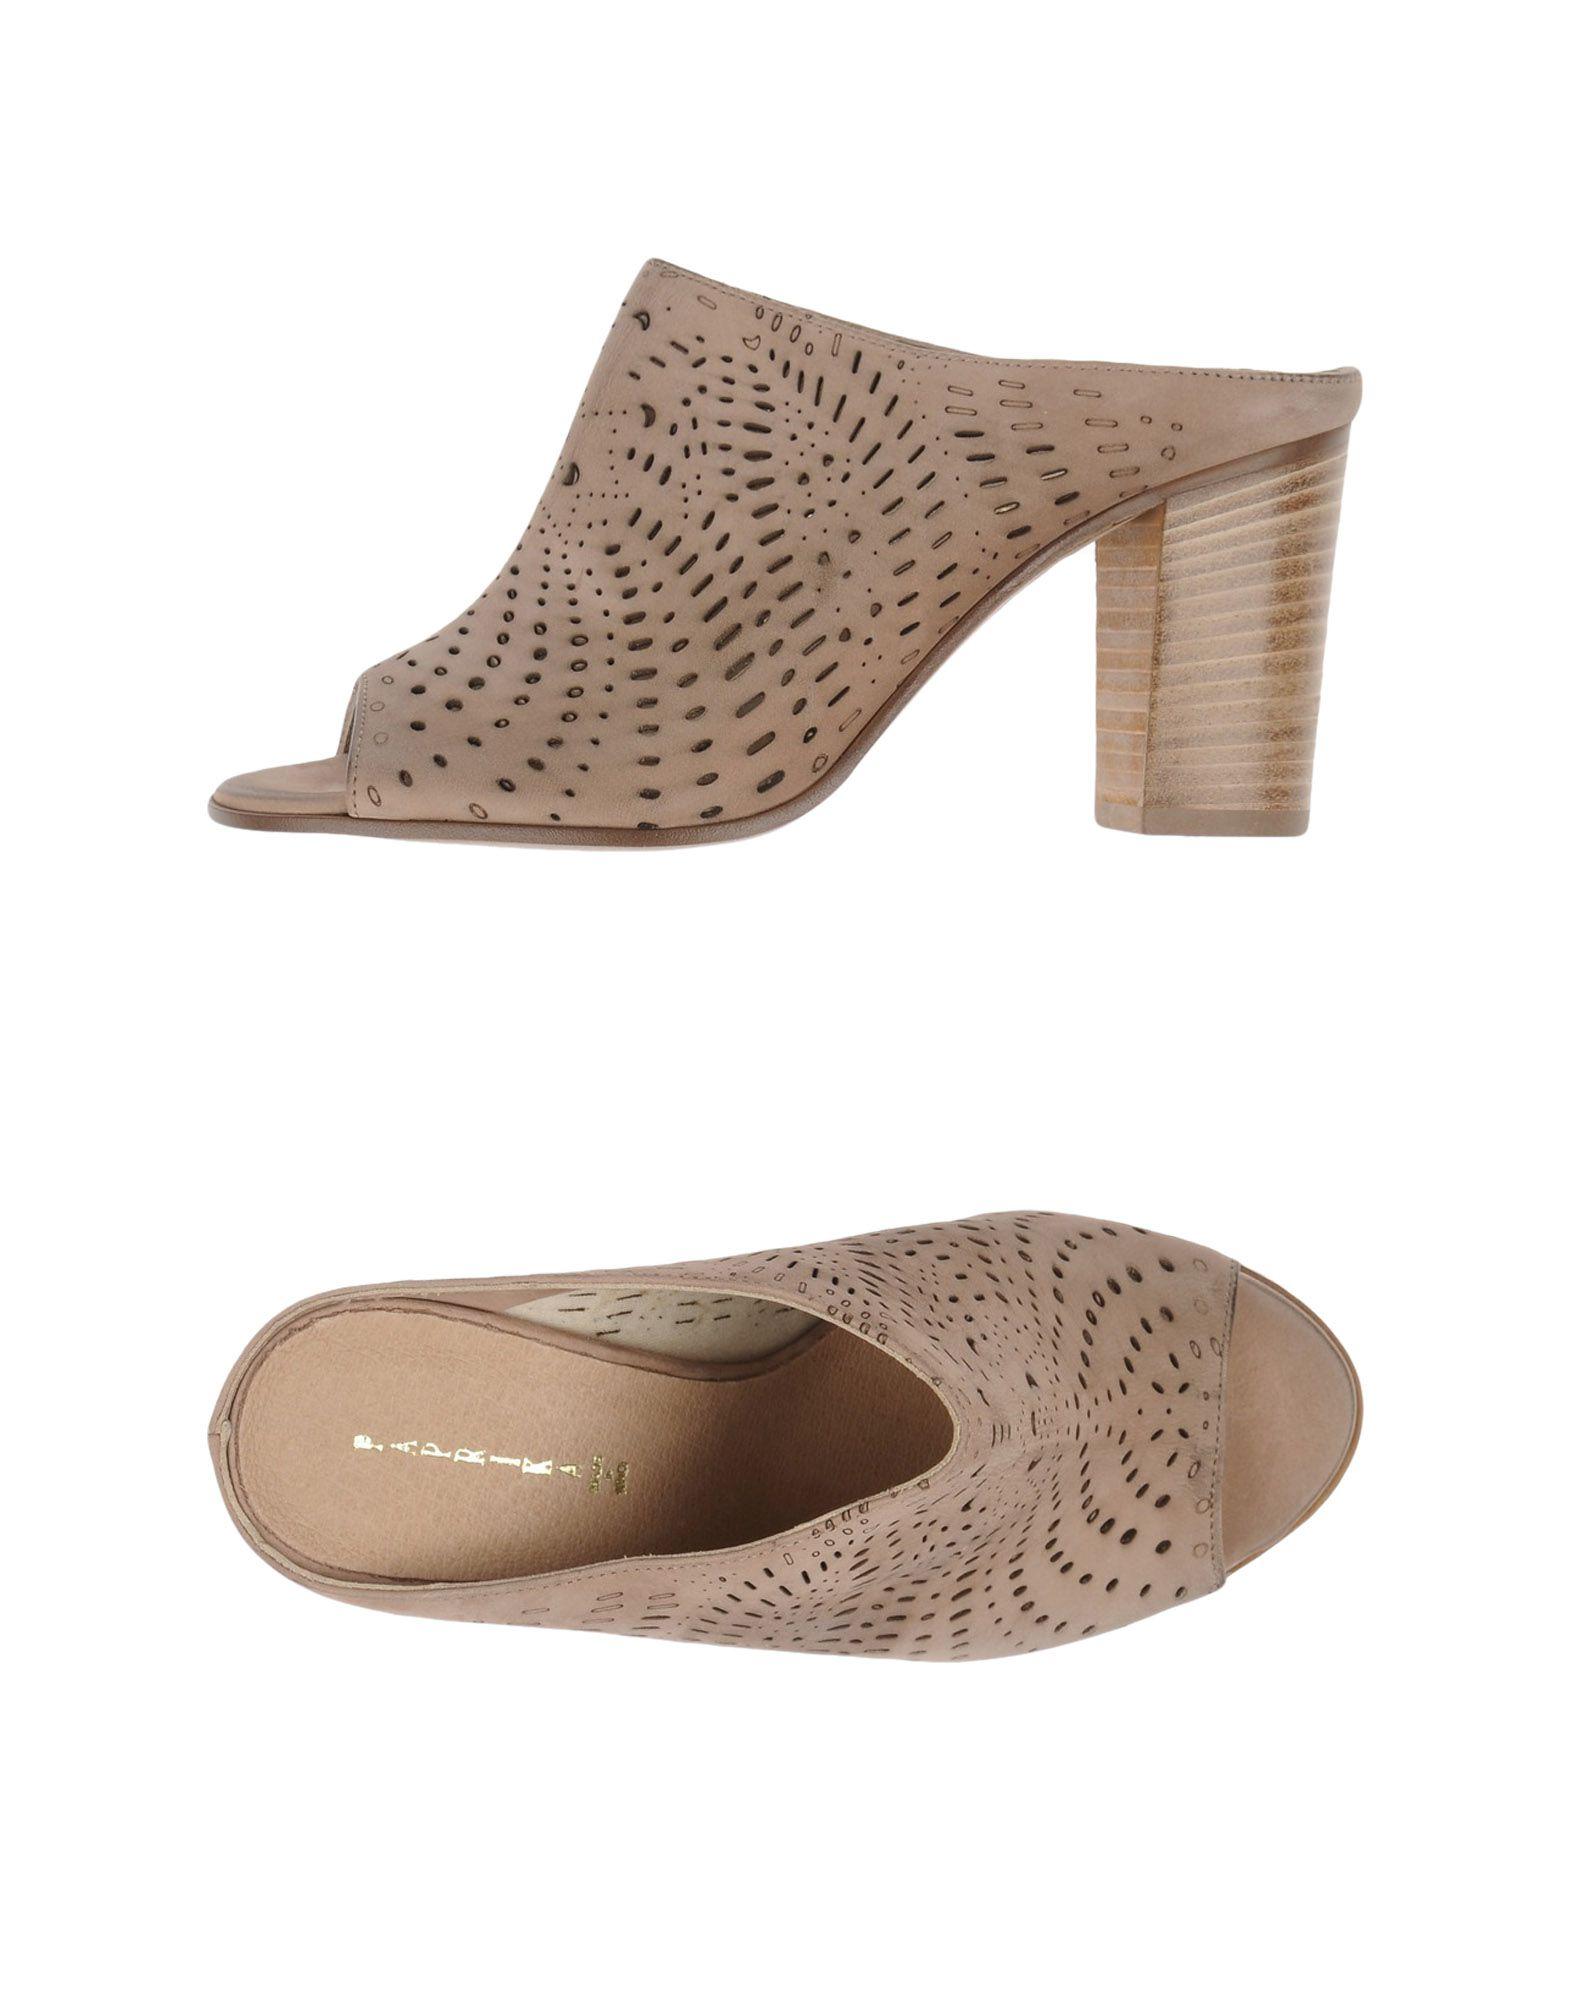 Sandales Paprika Femme - Sandales Paprika sur